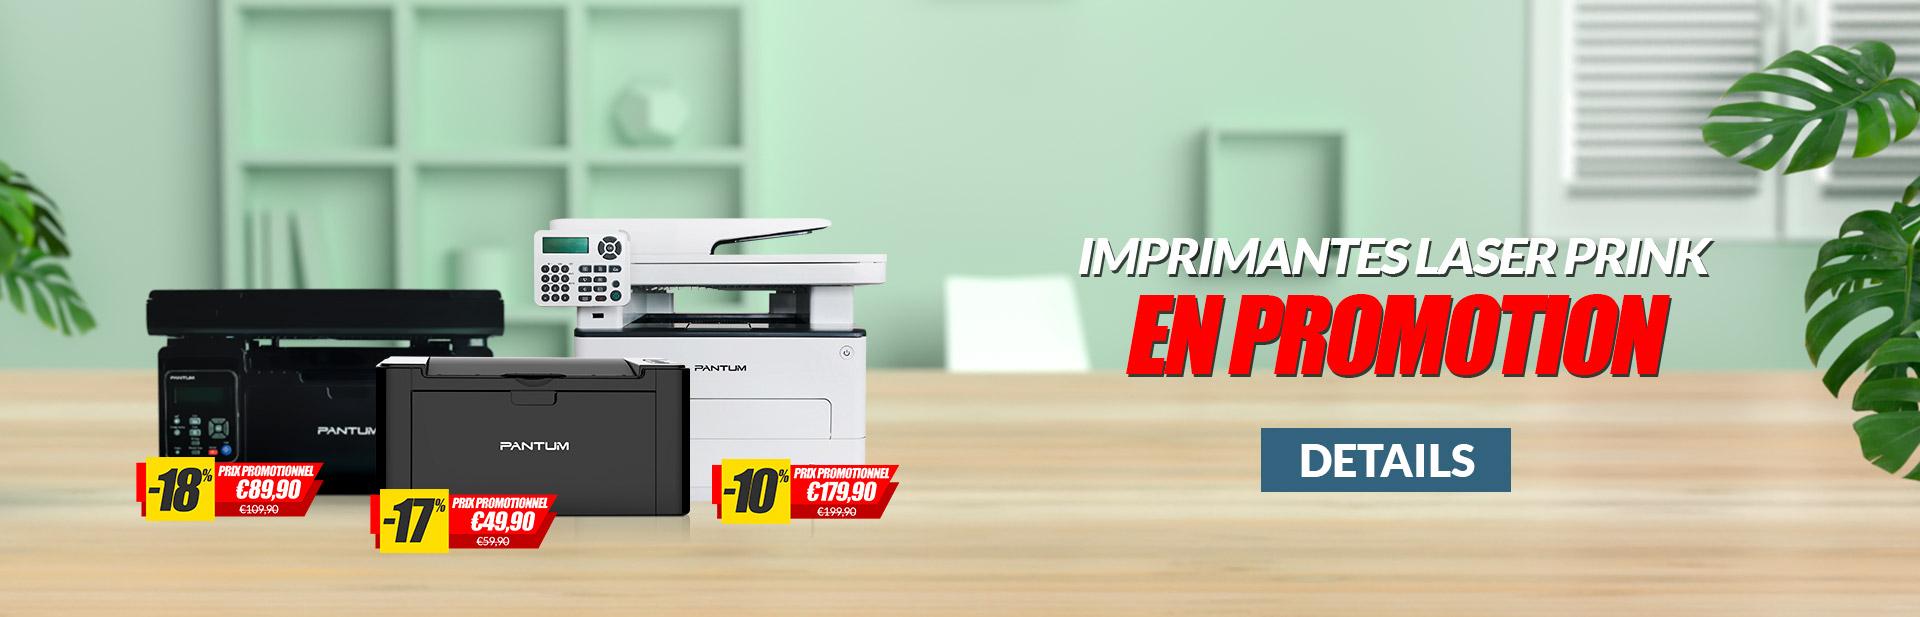 imprimante-multifonction-laser-pantum-en-promotion-SL